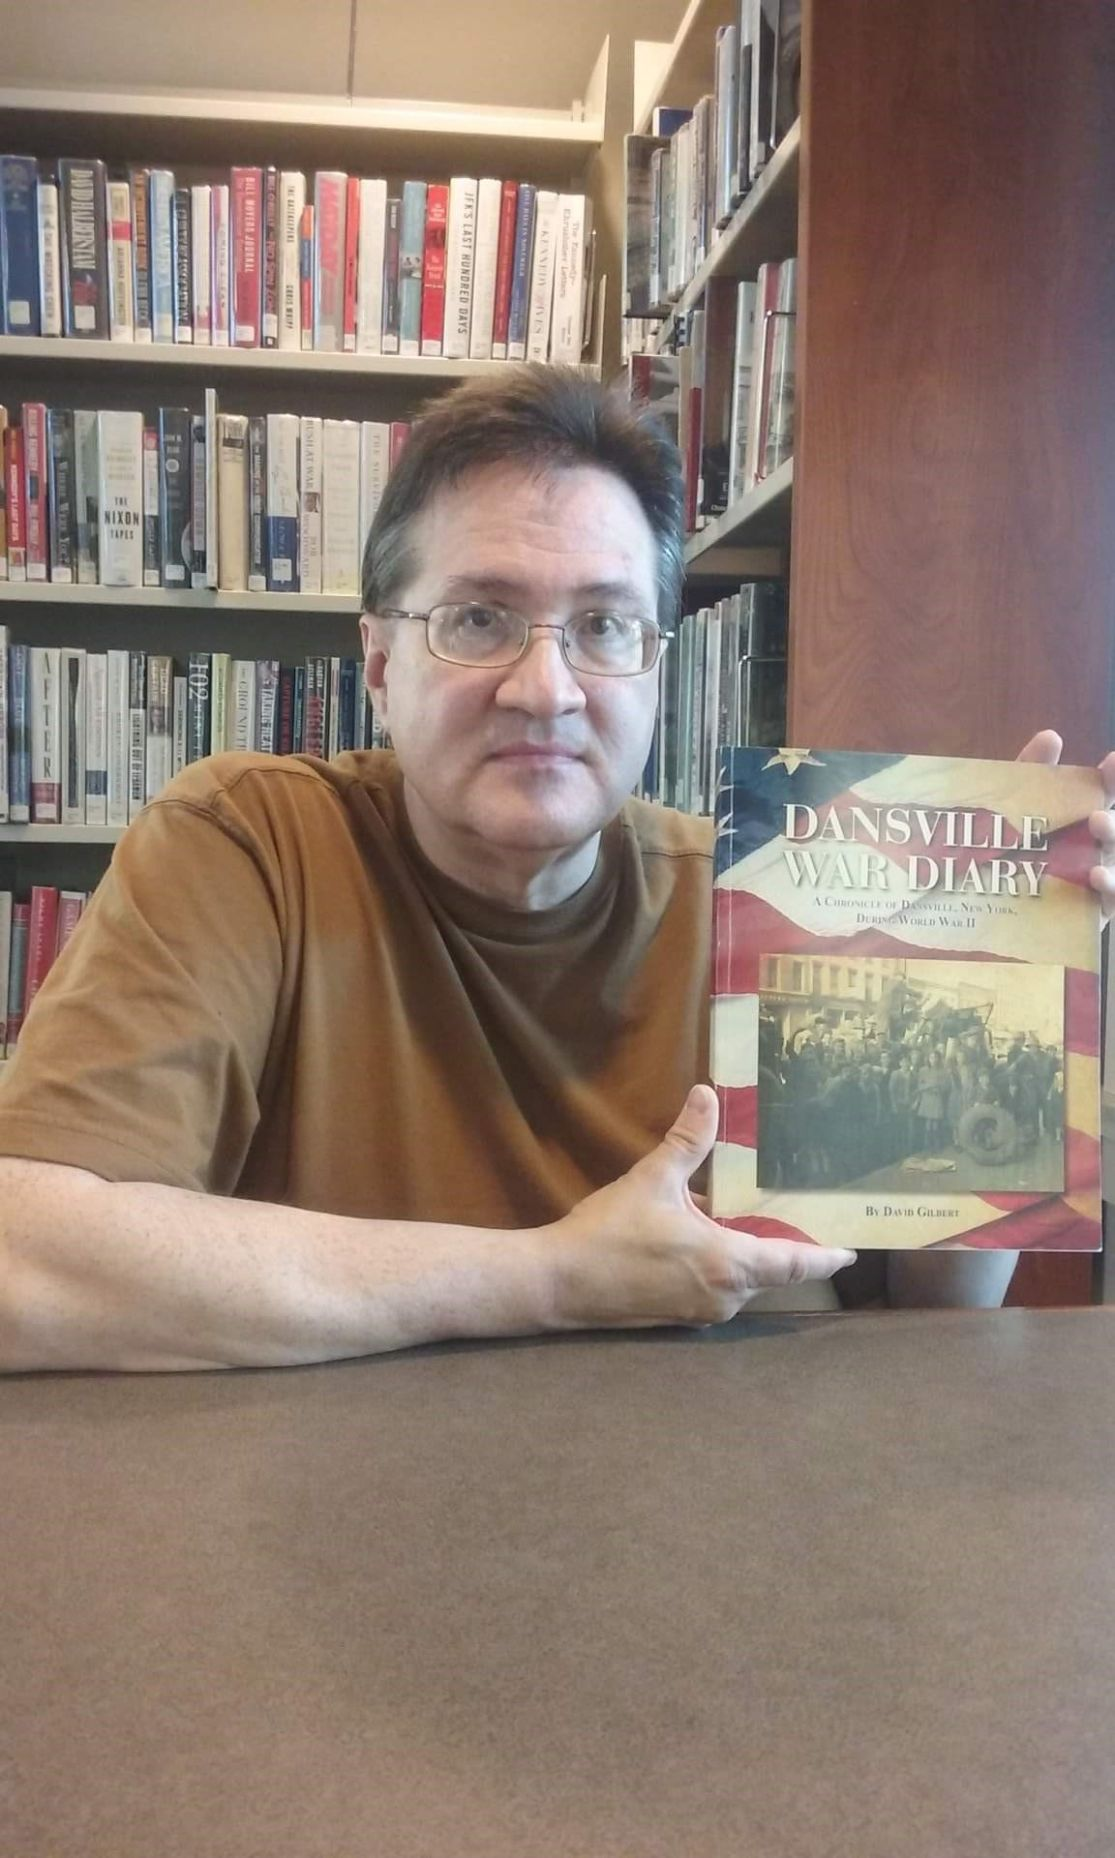 David Gilbert and his latest book